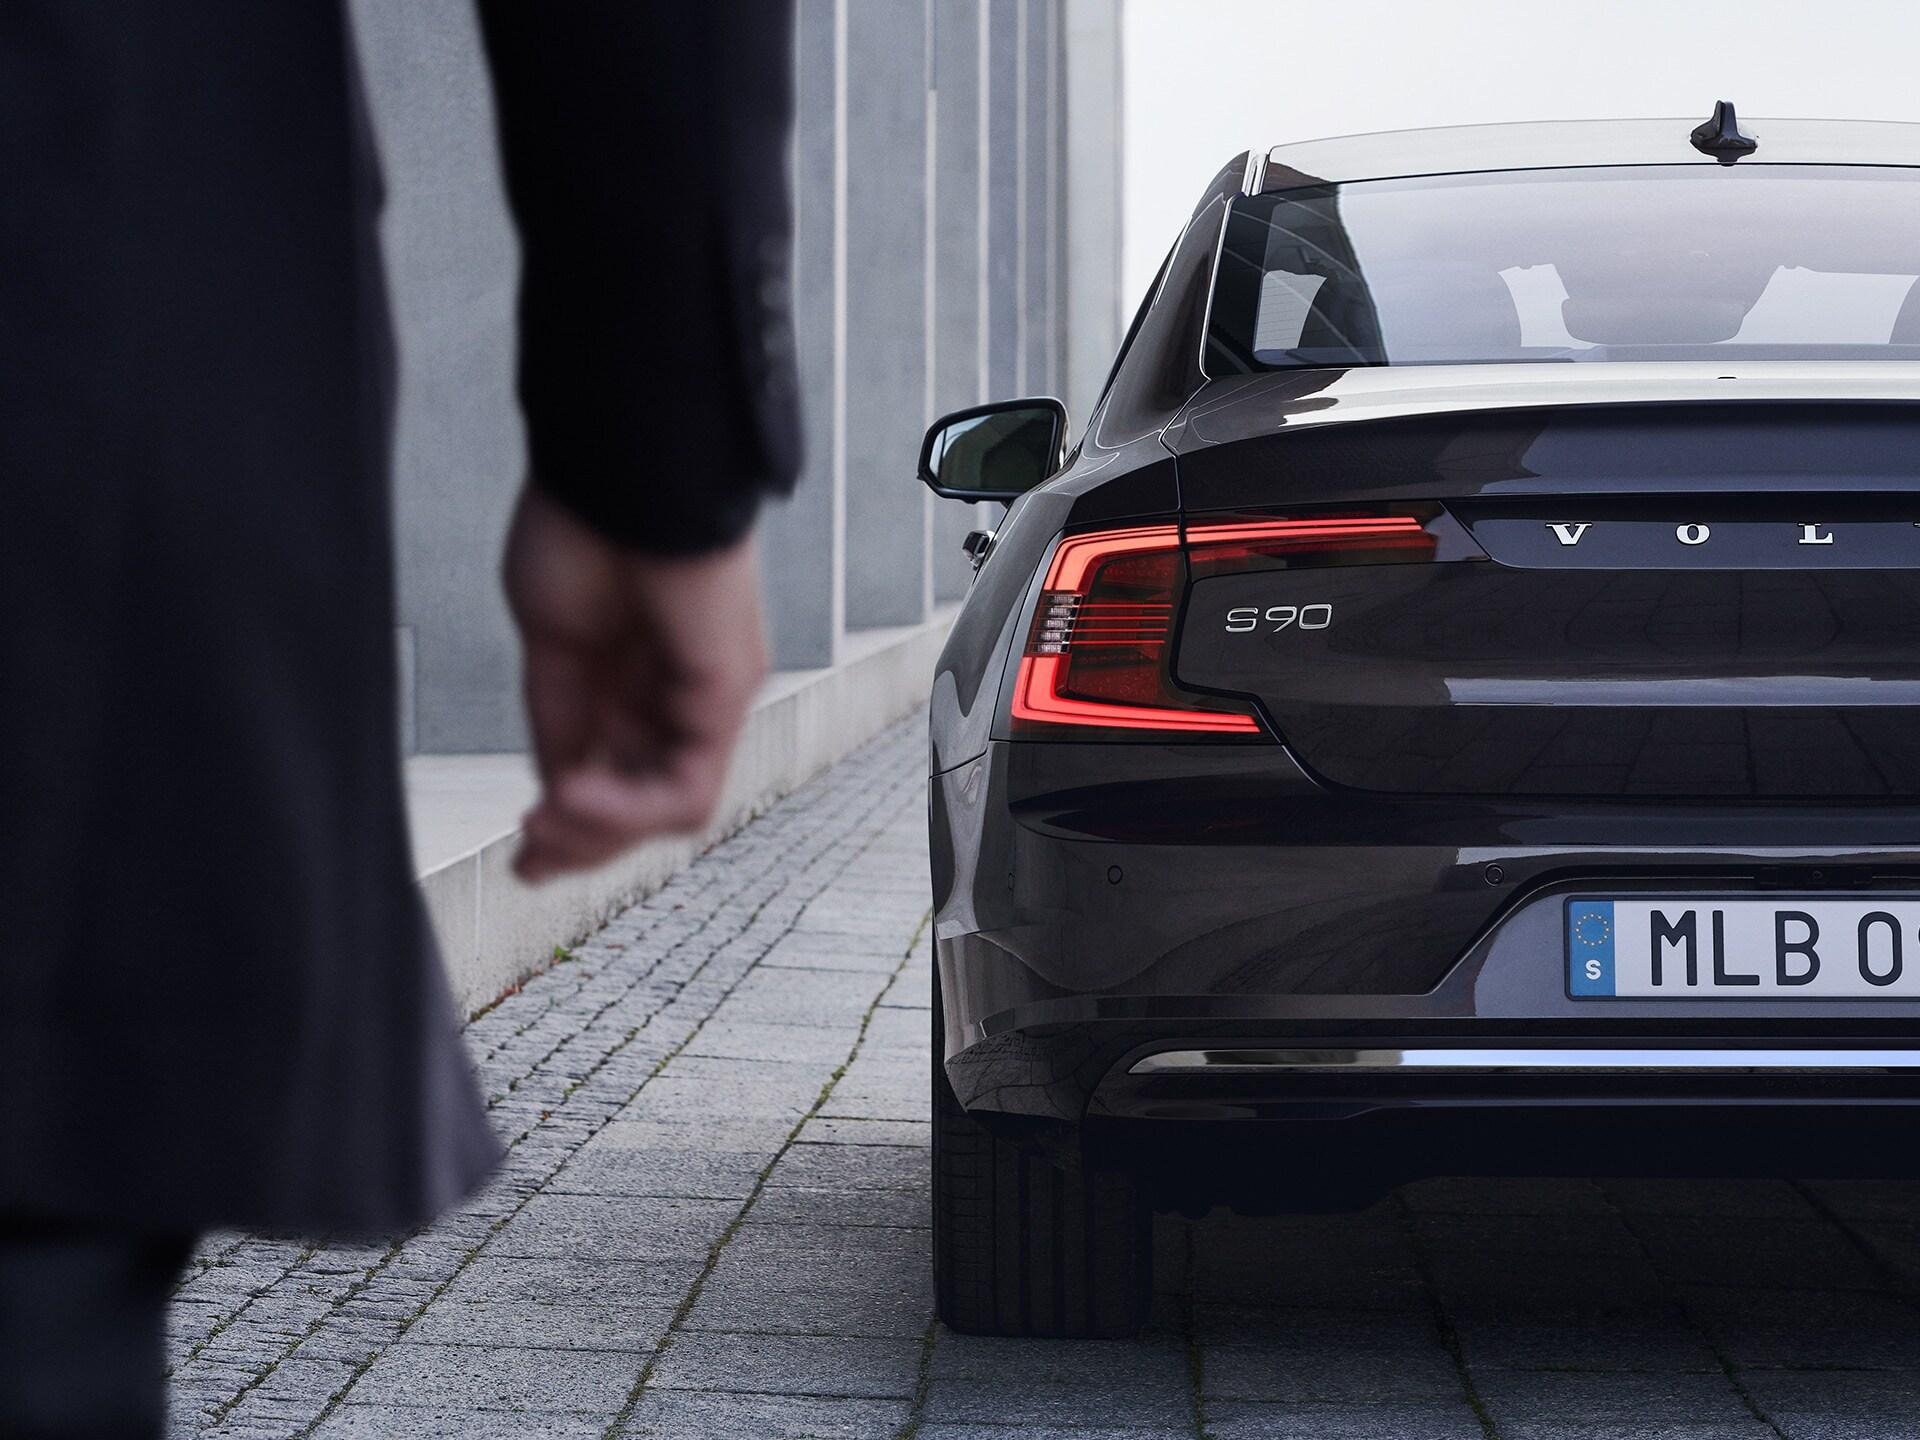 Mies kävelee kohti mustaa Volvo S90 -sedania